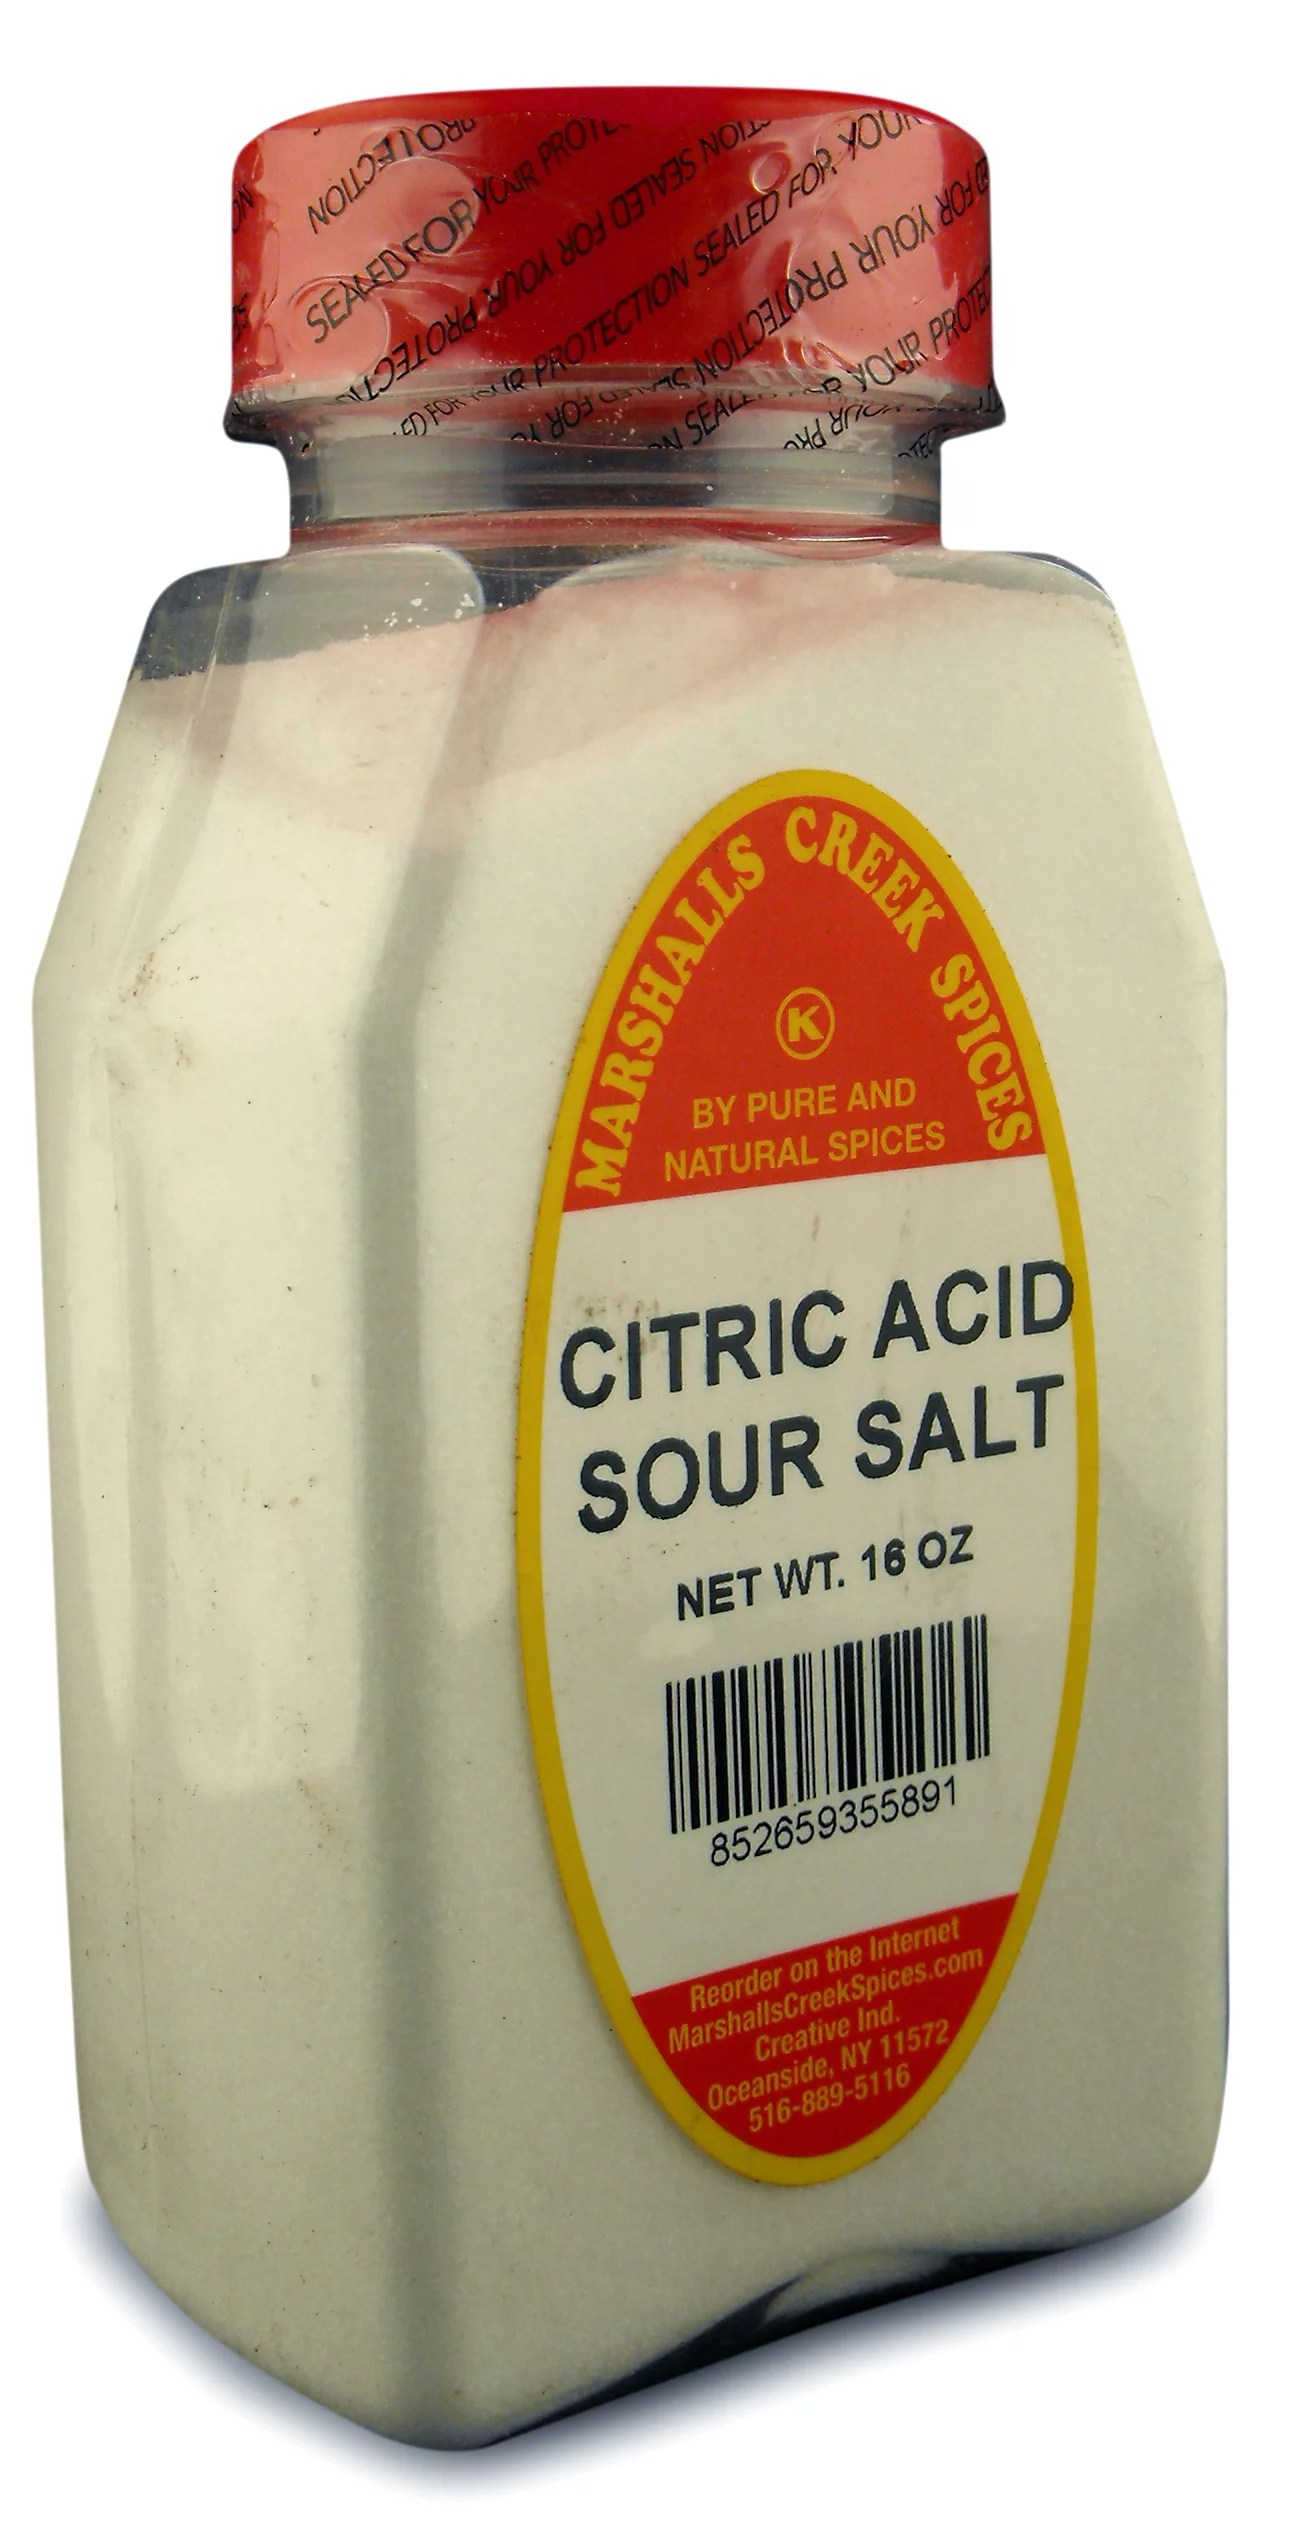 Marshalls Creek Spices SOUR SALT CITRIC ACID 16 ounce ...